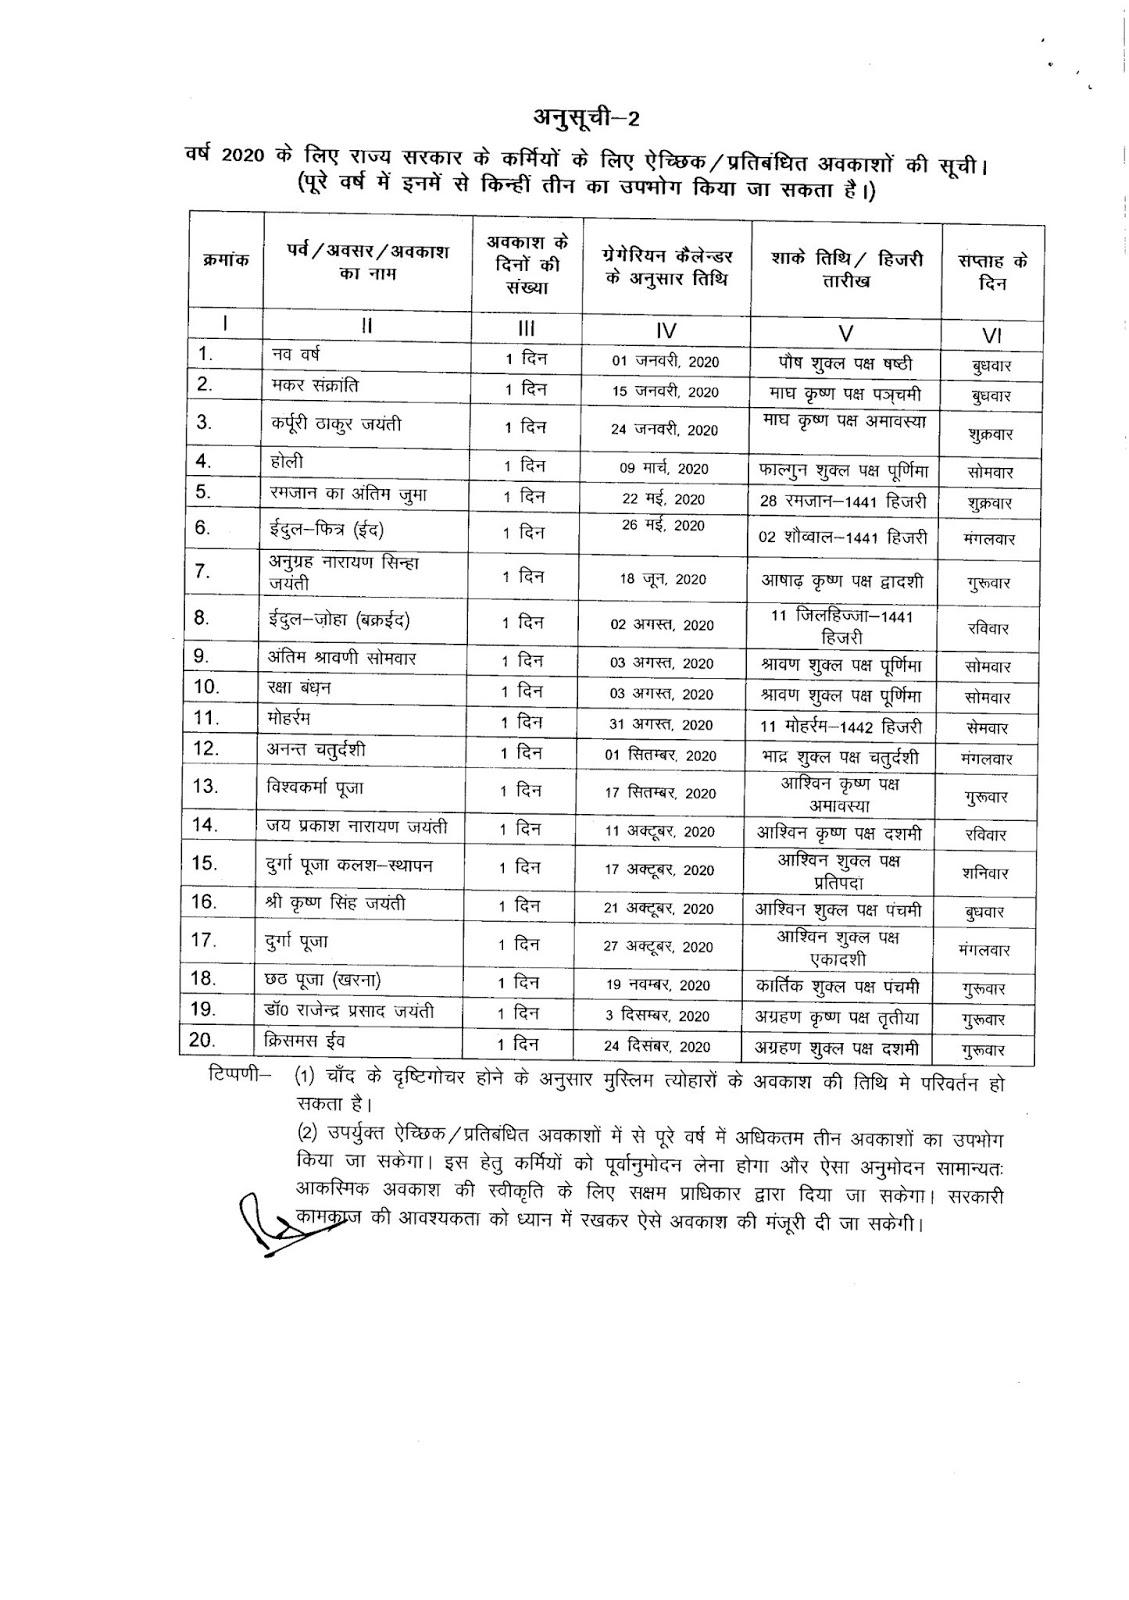 Bihar Government Calendar 2020 #educratsweb with regard to Government Calendar 2020 Bihar